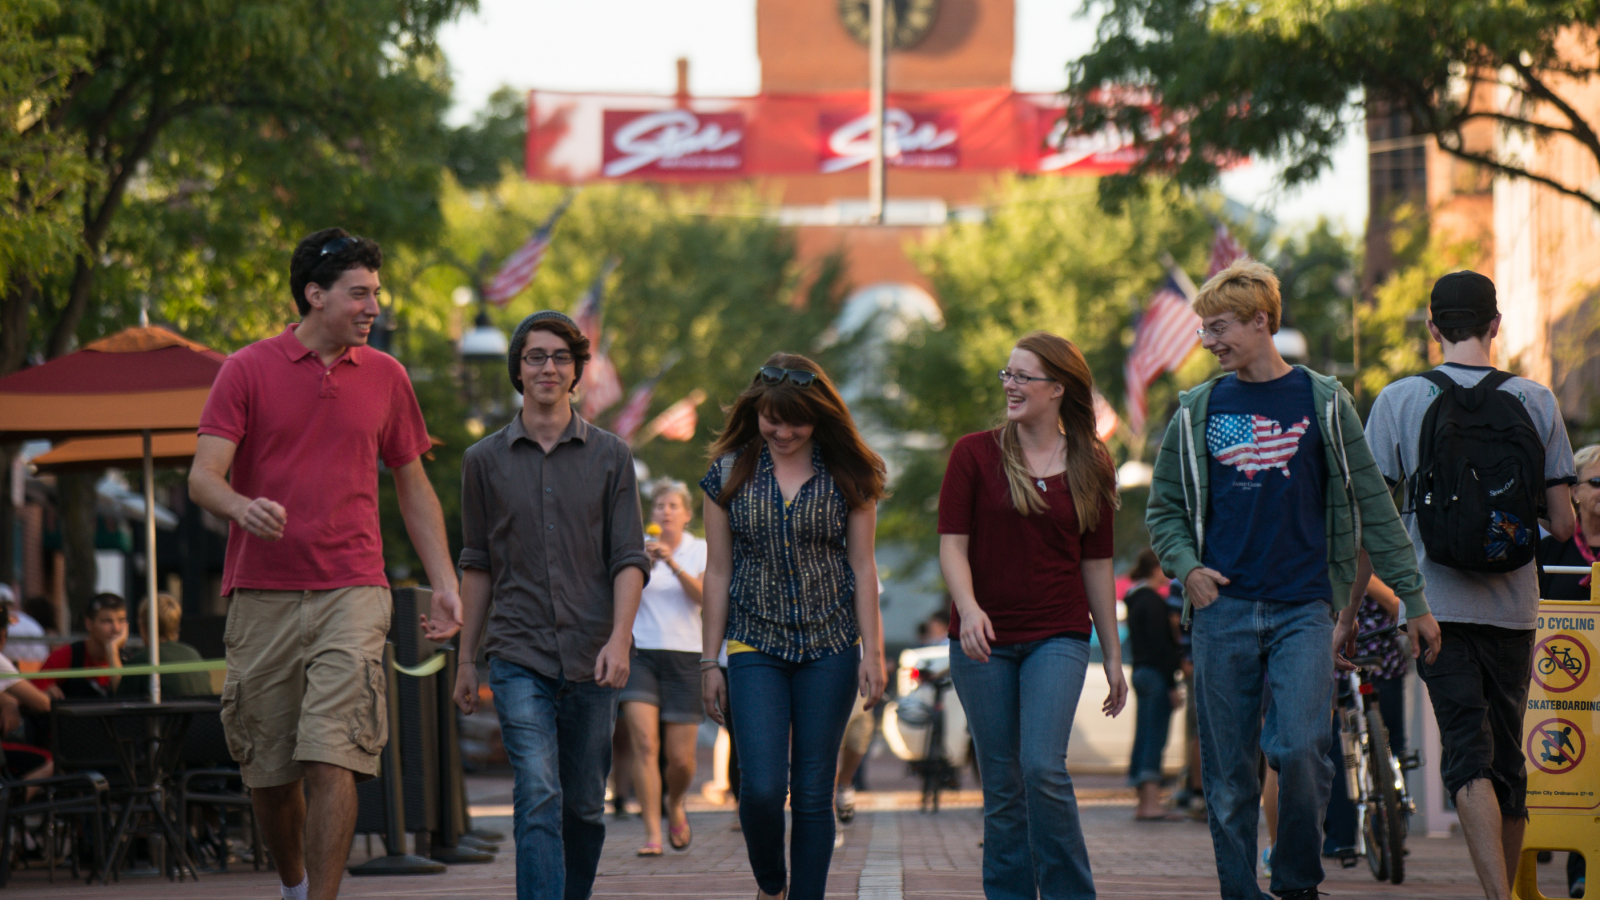 Students walking down Church Street in Burlington